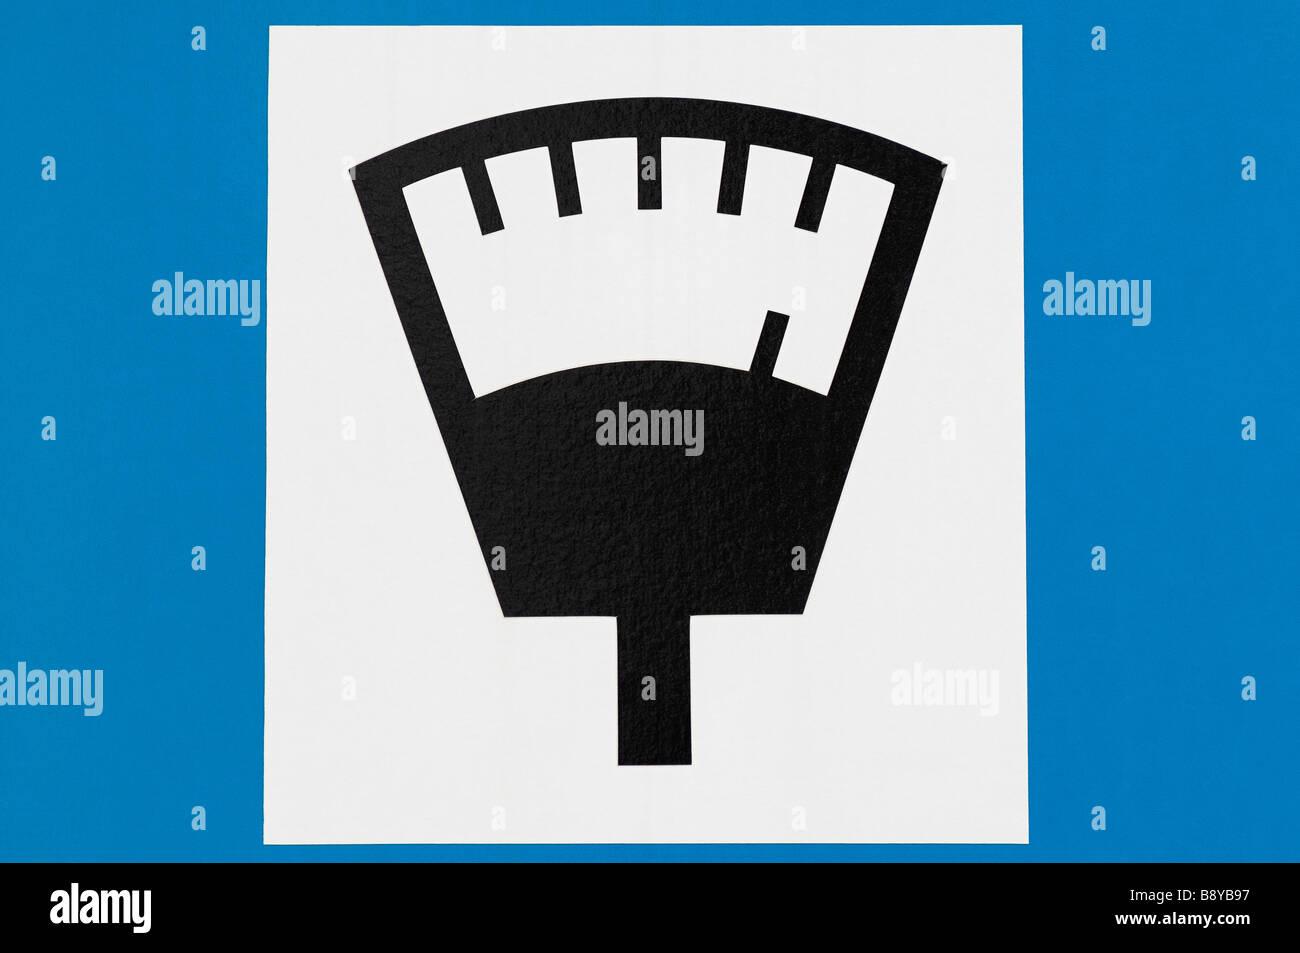 Parking Meter Sign Close Up - Stock Image